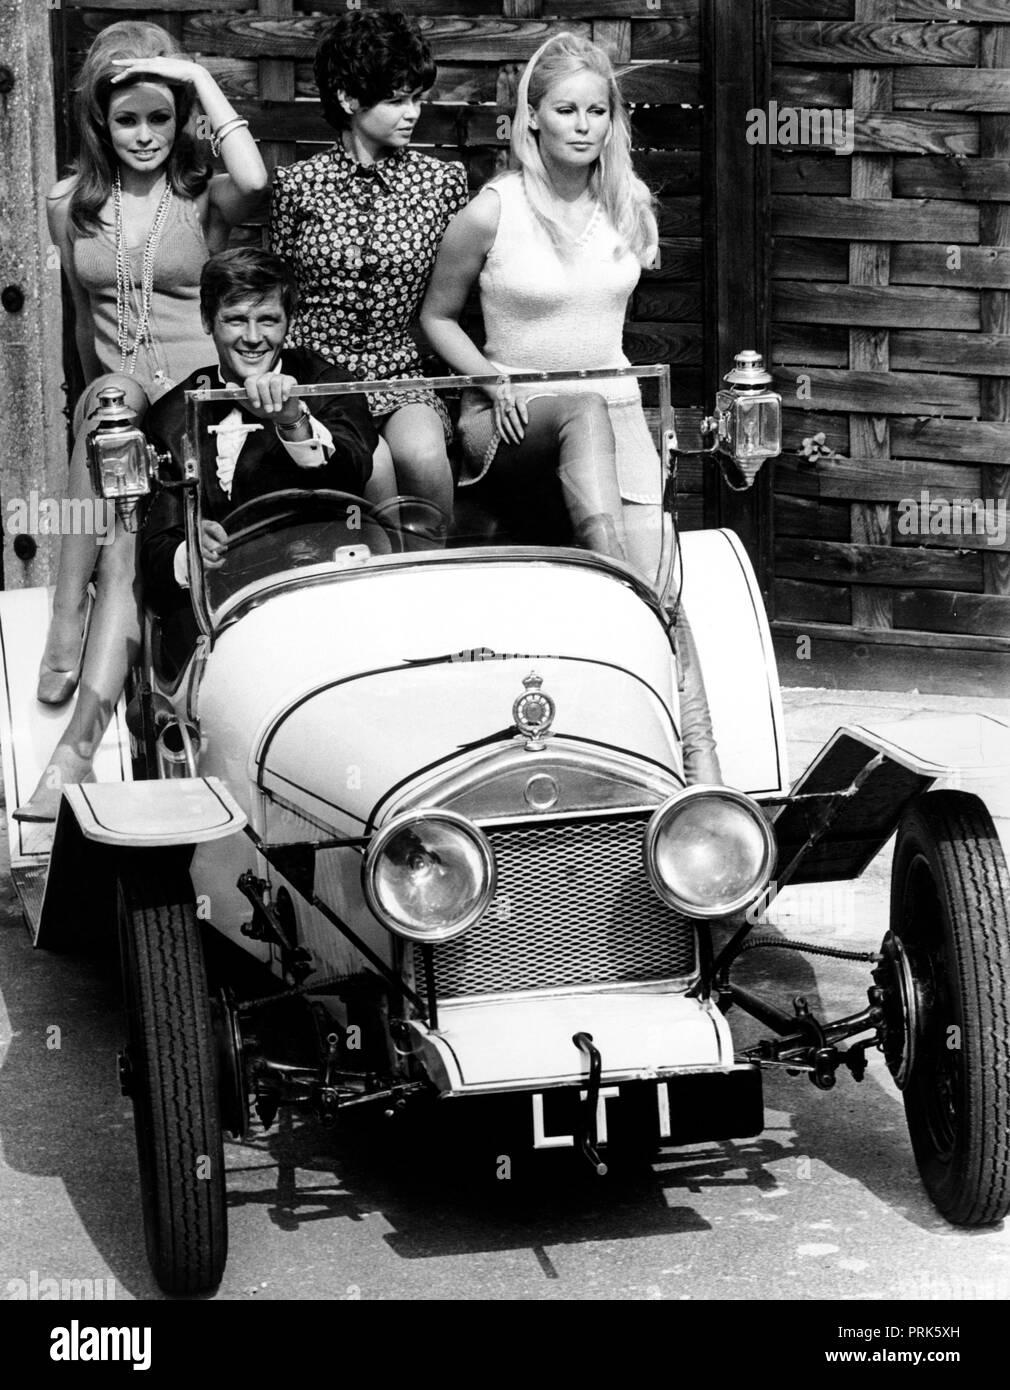 claudie lange, martha hyer, veronica carlson, roger moore, crossplot, 1968 - Stock Image